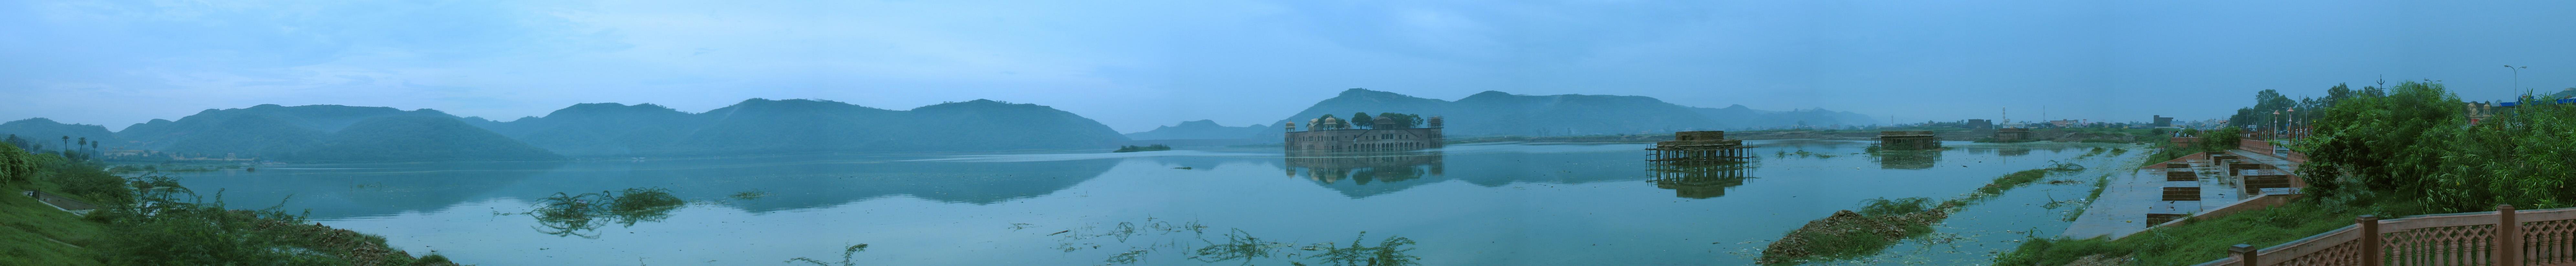 English: Jal Mahal in Jaipur Rajastan. This pa...